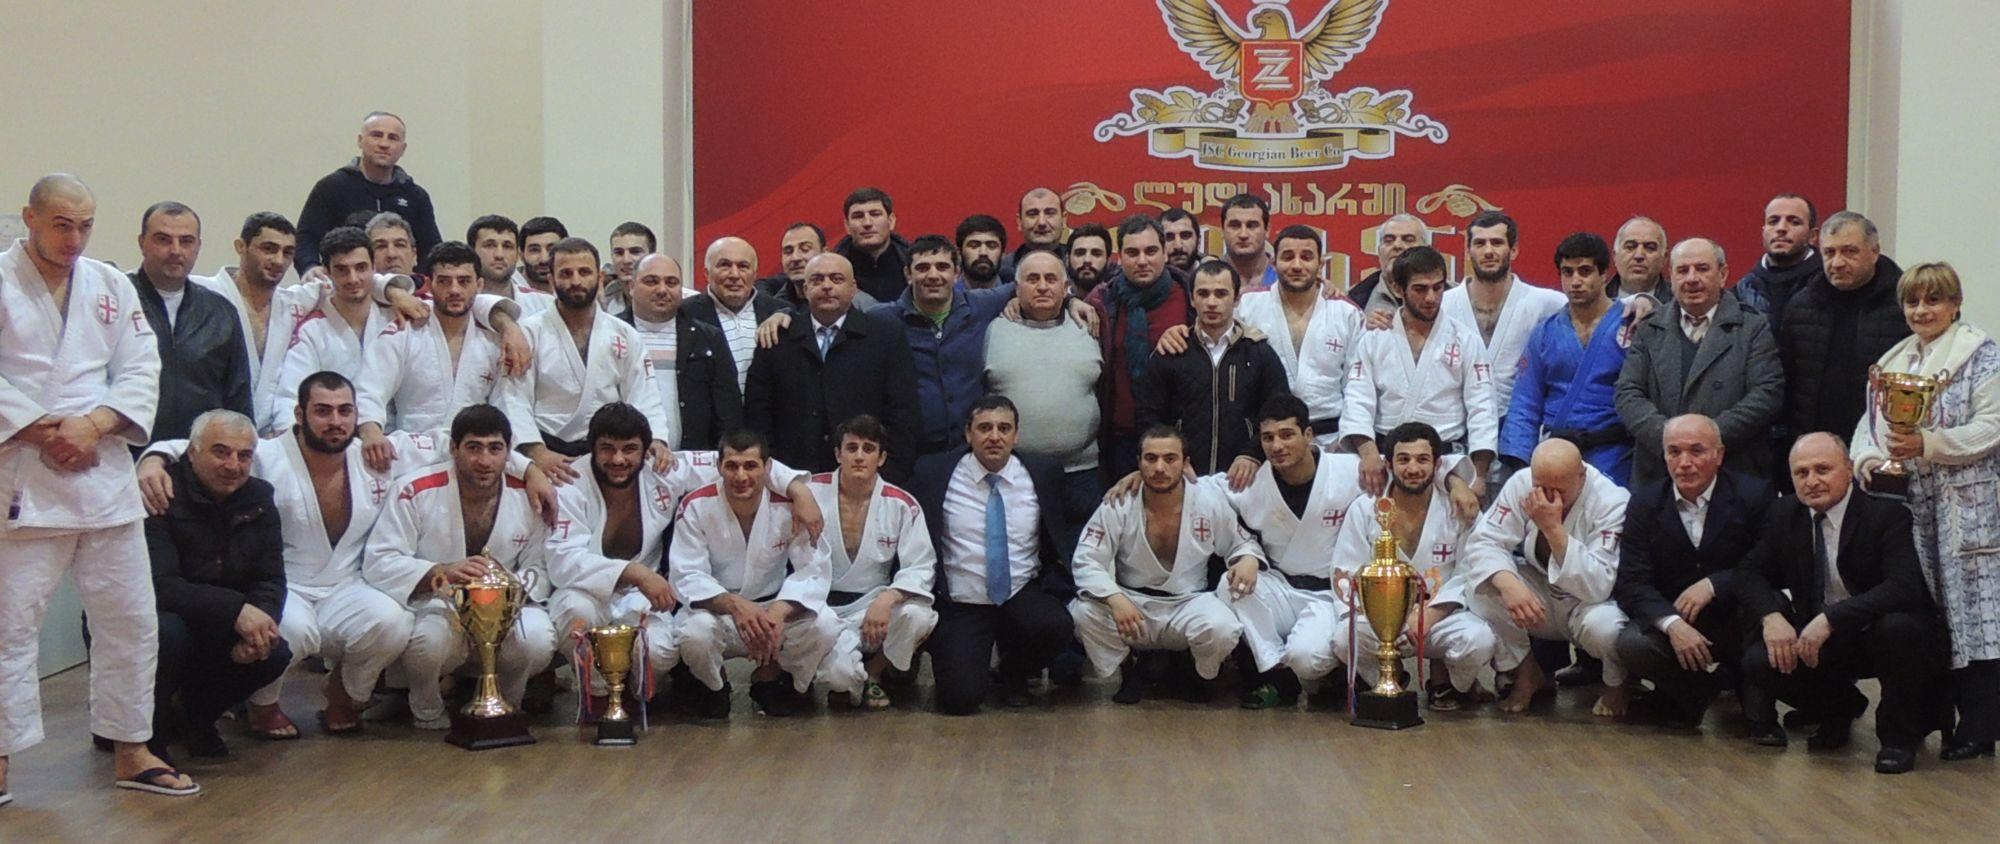 Georgian Club Championships 2016